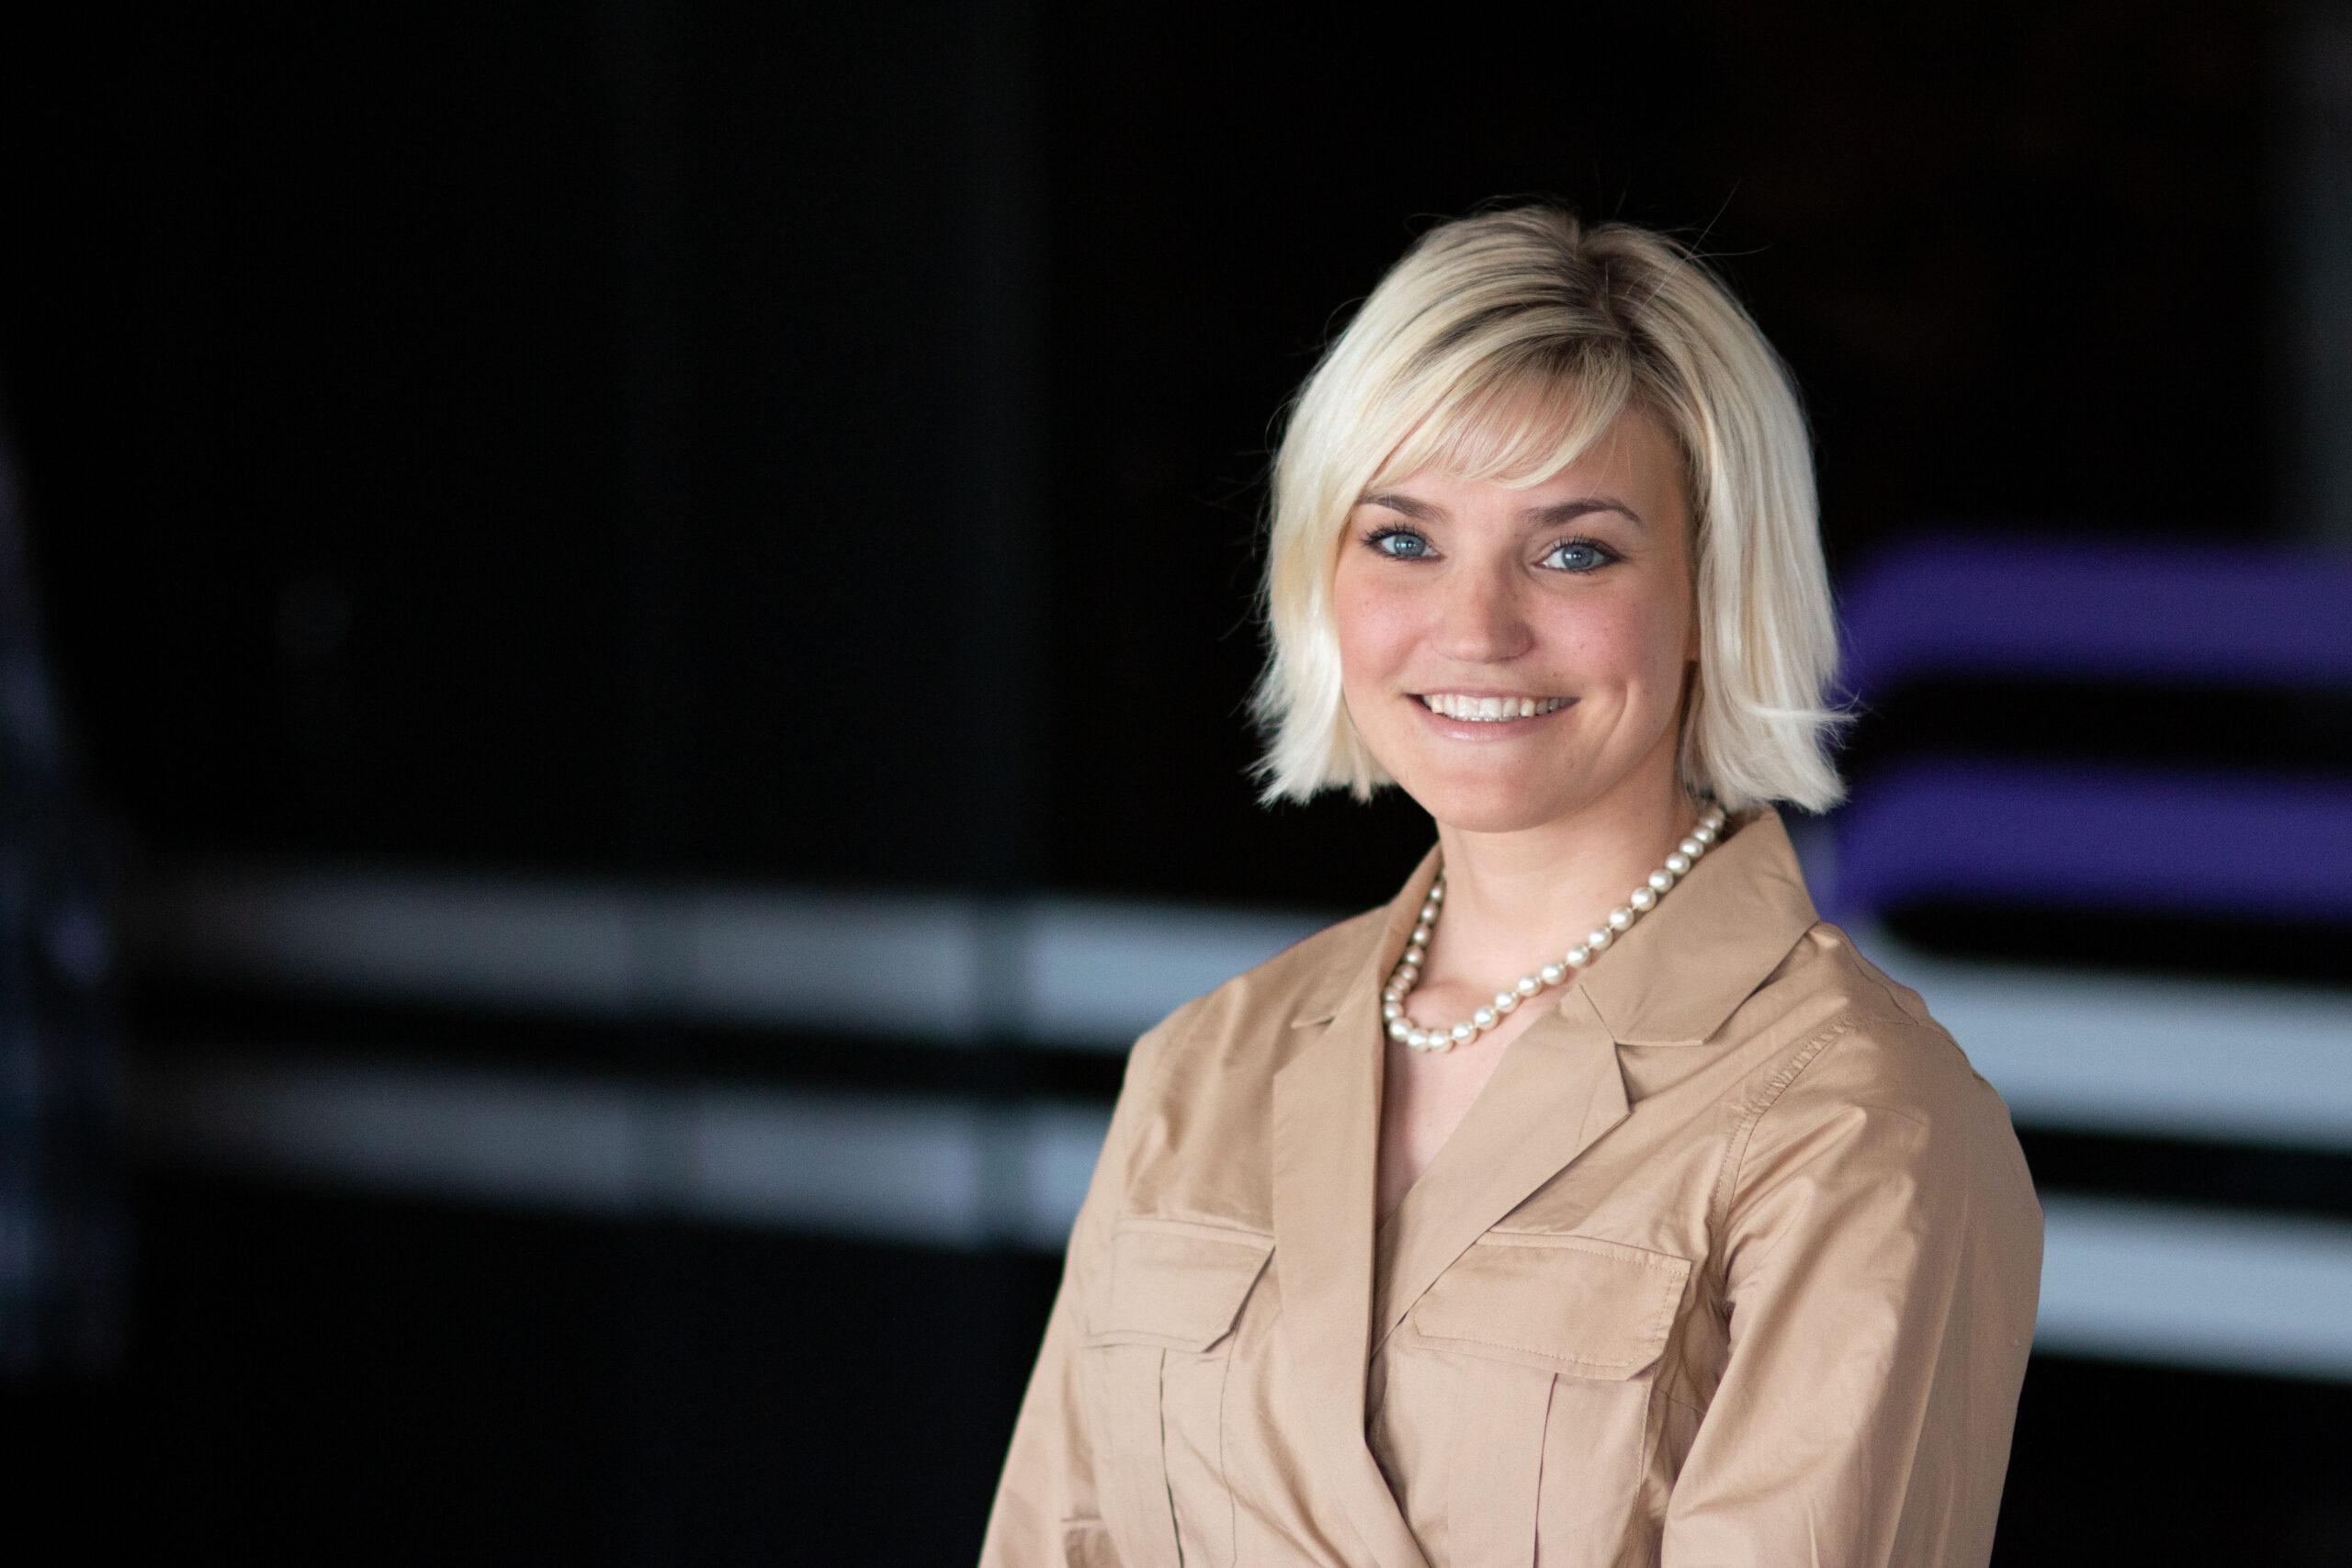 Sonja Semmelmayr